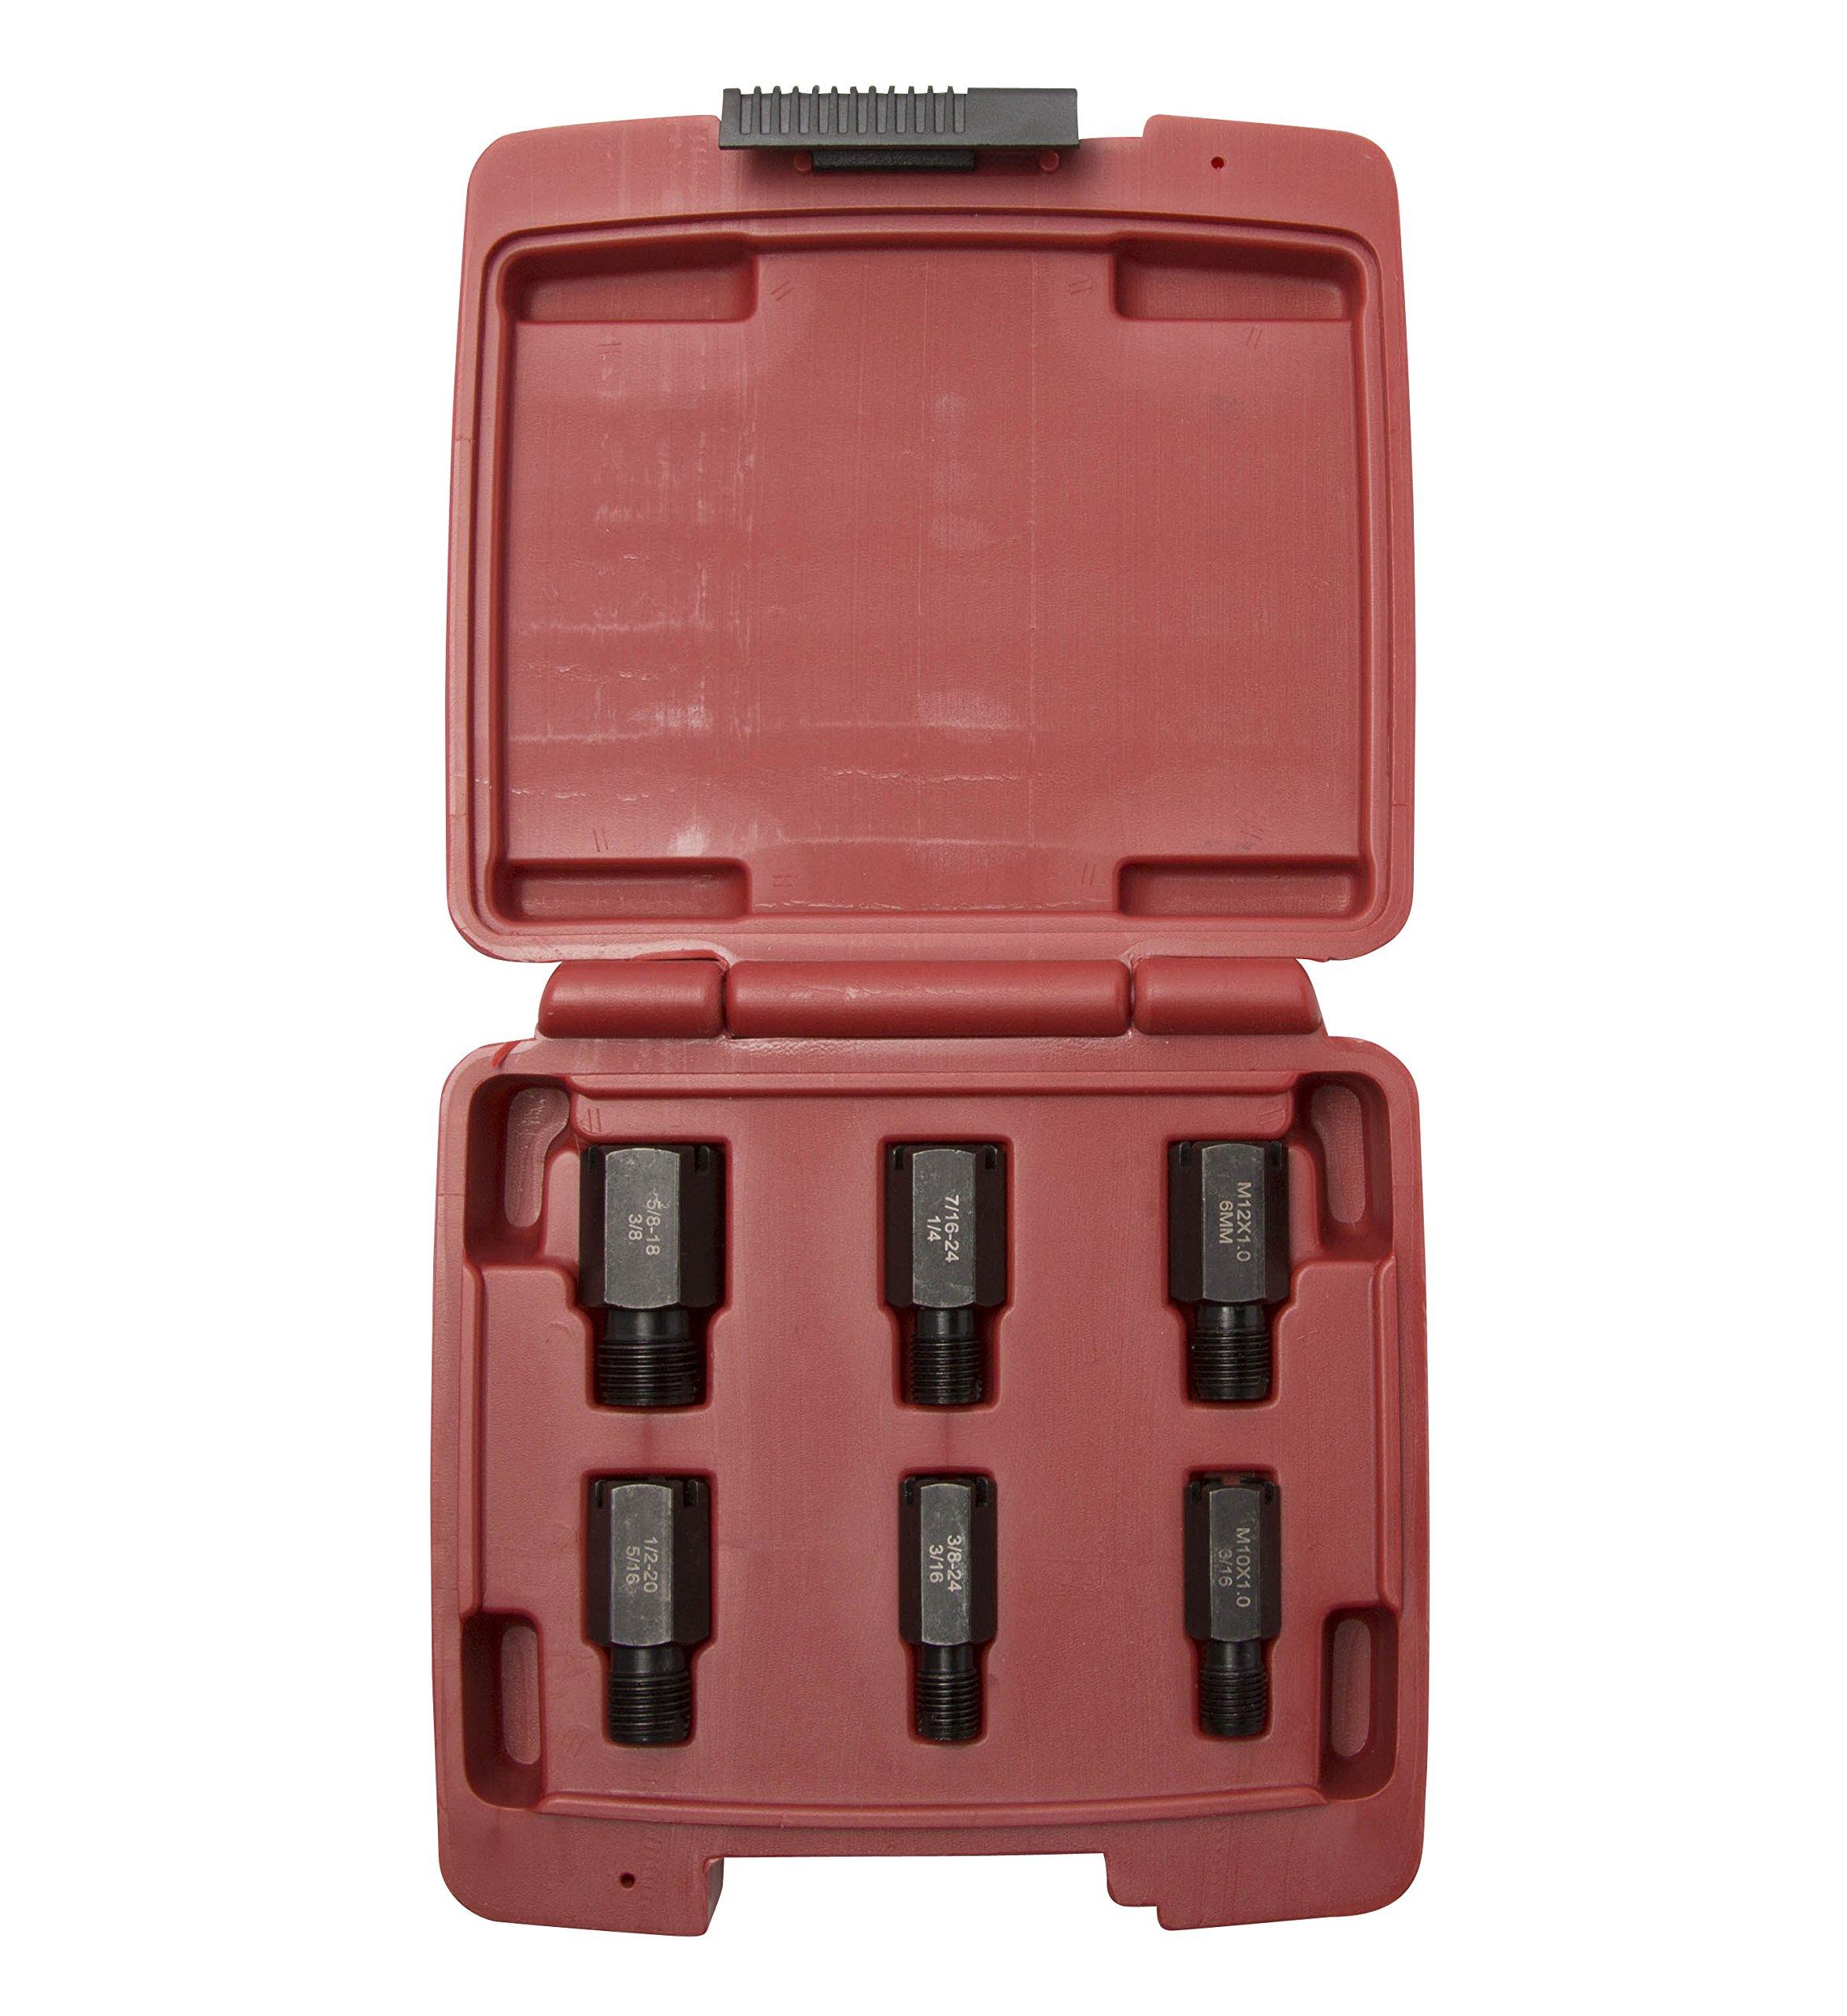 Steelman Lock Technology LT993 Brake Line/Cylinder Re-Threading Kit by Steelman (Image #4)